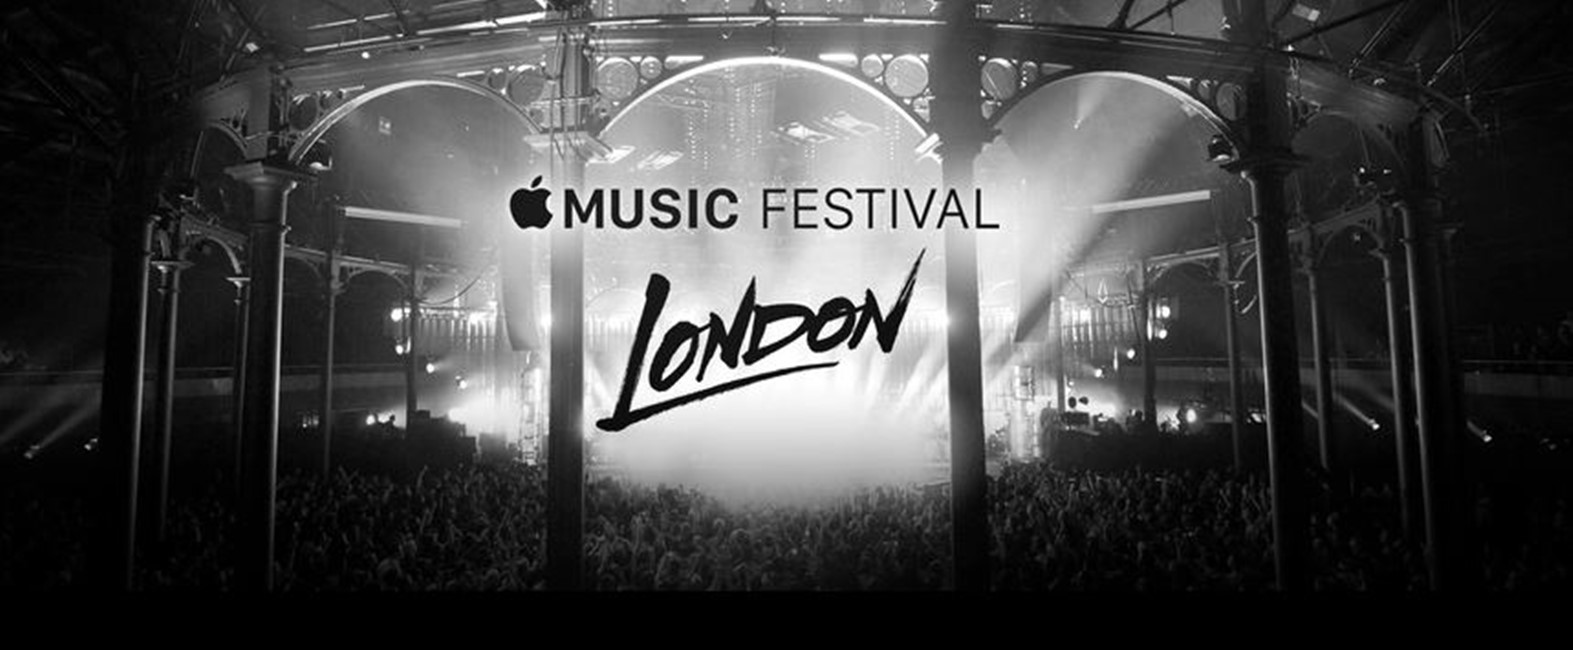 Apple Music Festival Londra